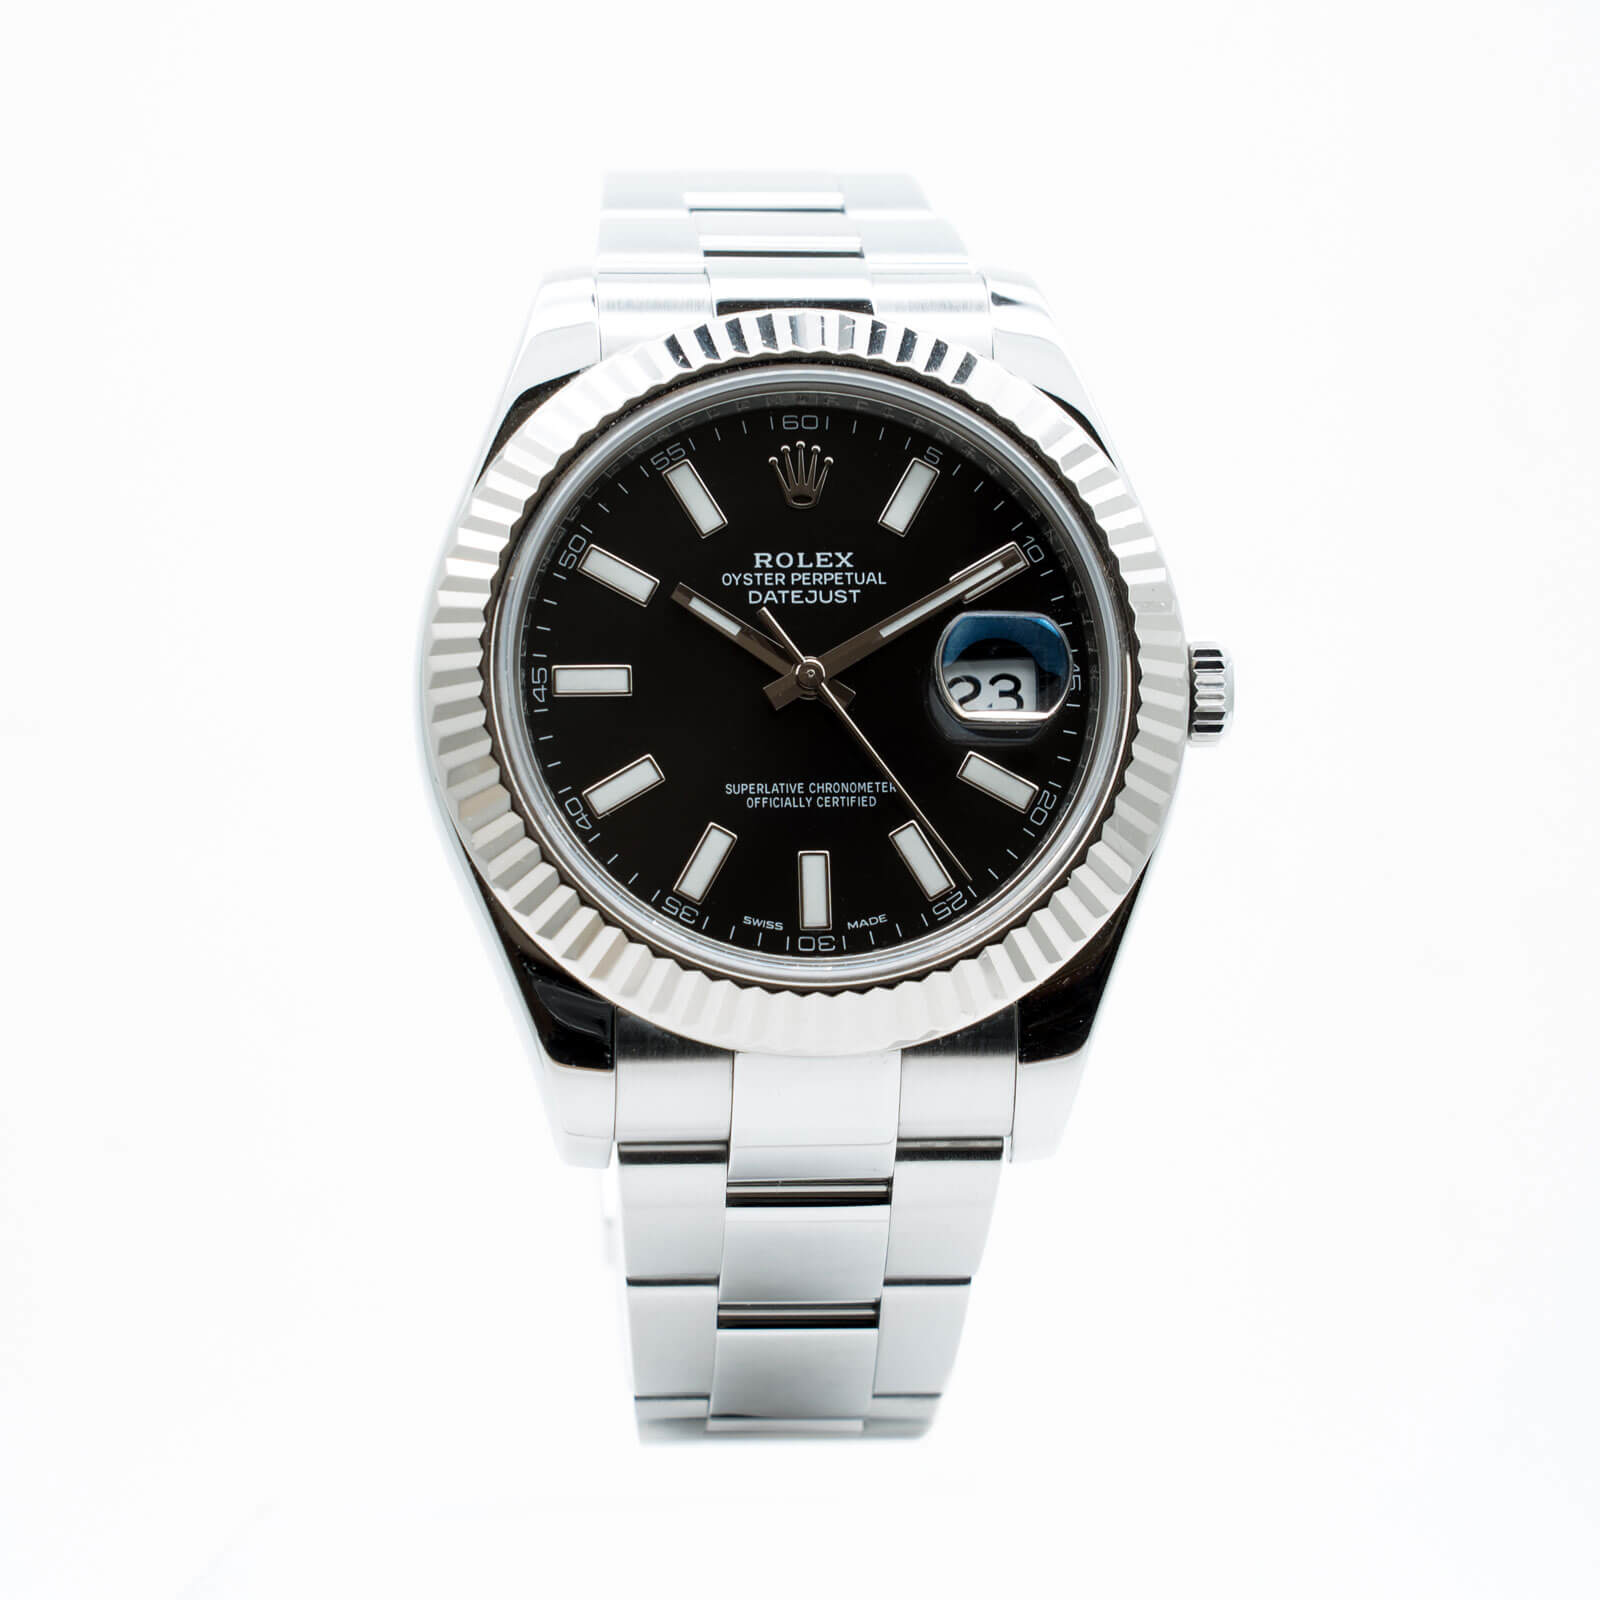 086094307fe23 ROLEX Rolex Oyster Perpetuel DateJust II - Lionel Meylan Vevey